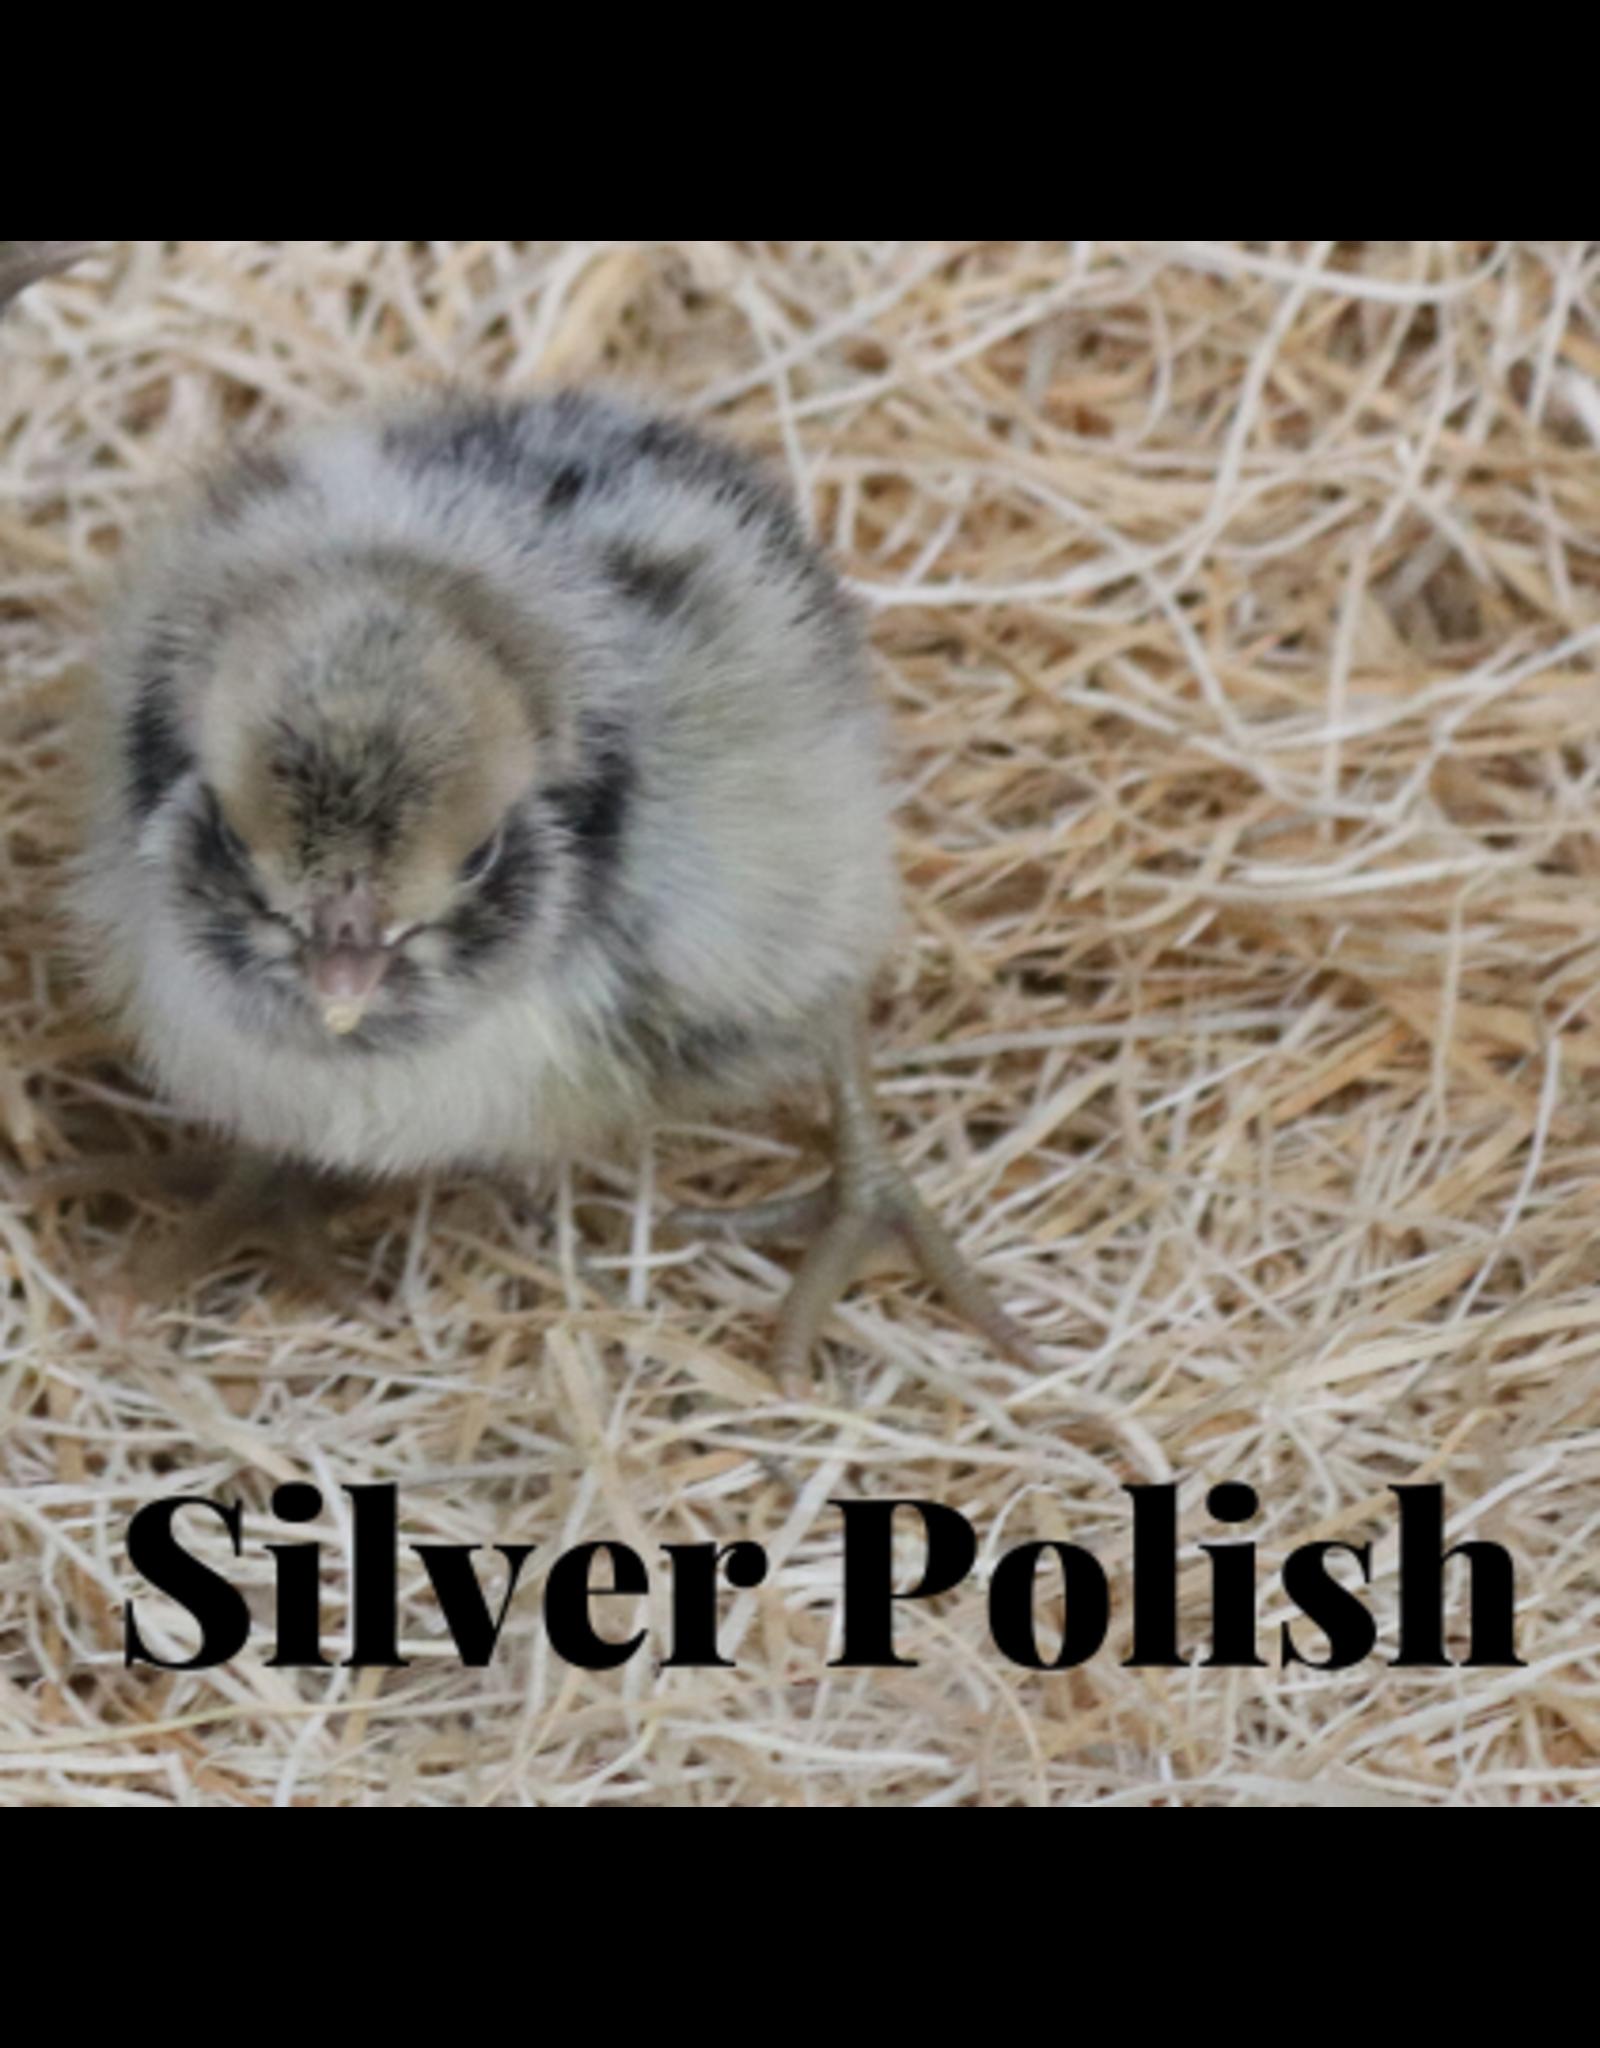 Silver Lace Polish Jan 23